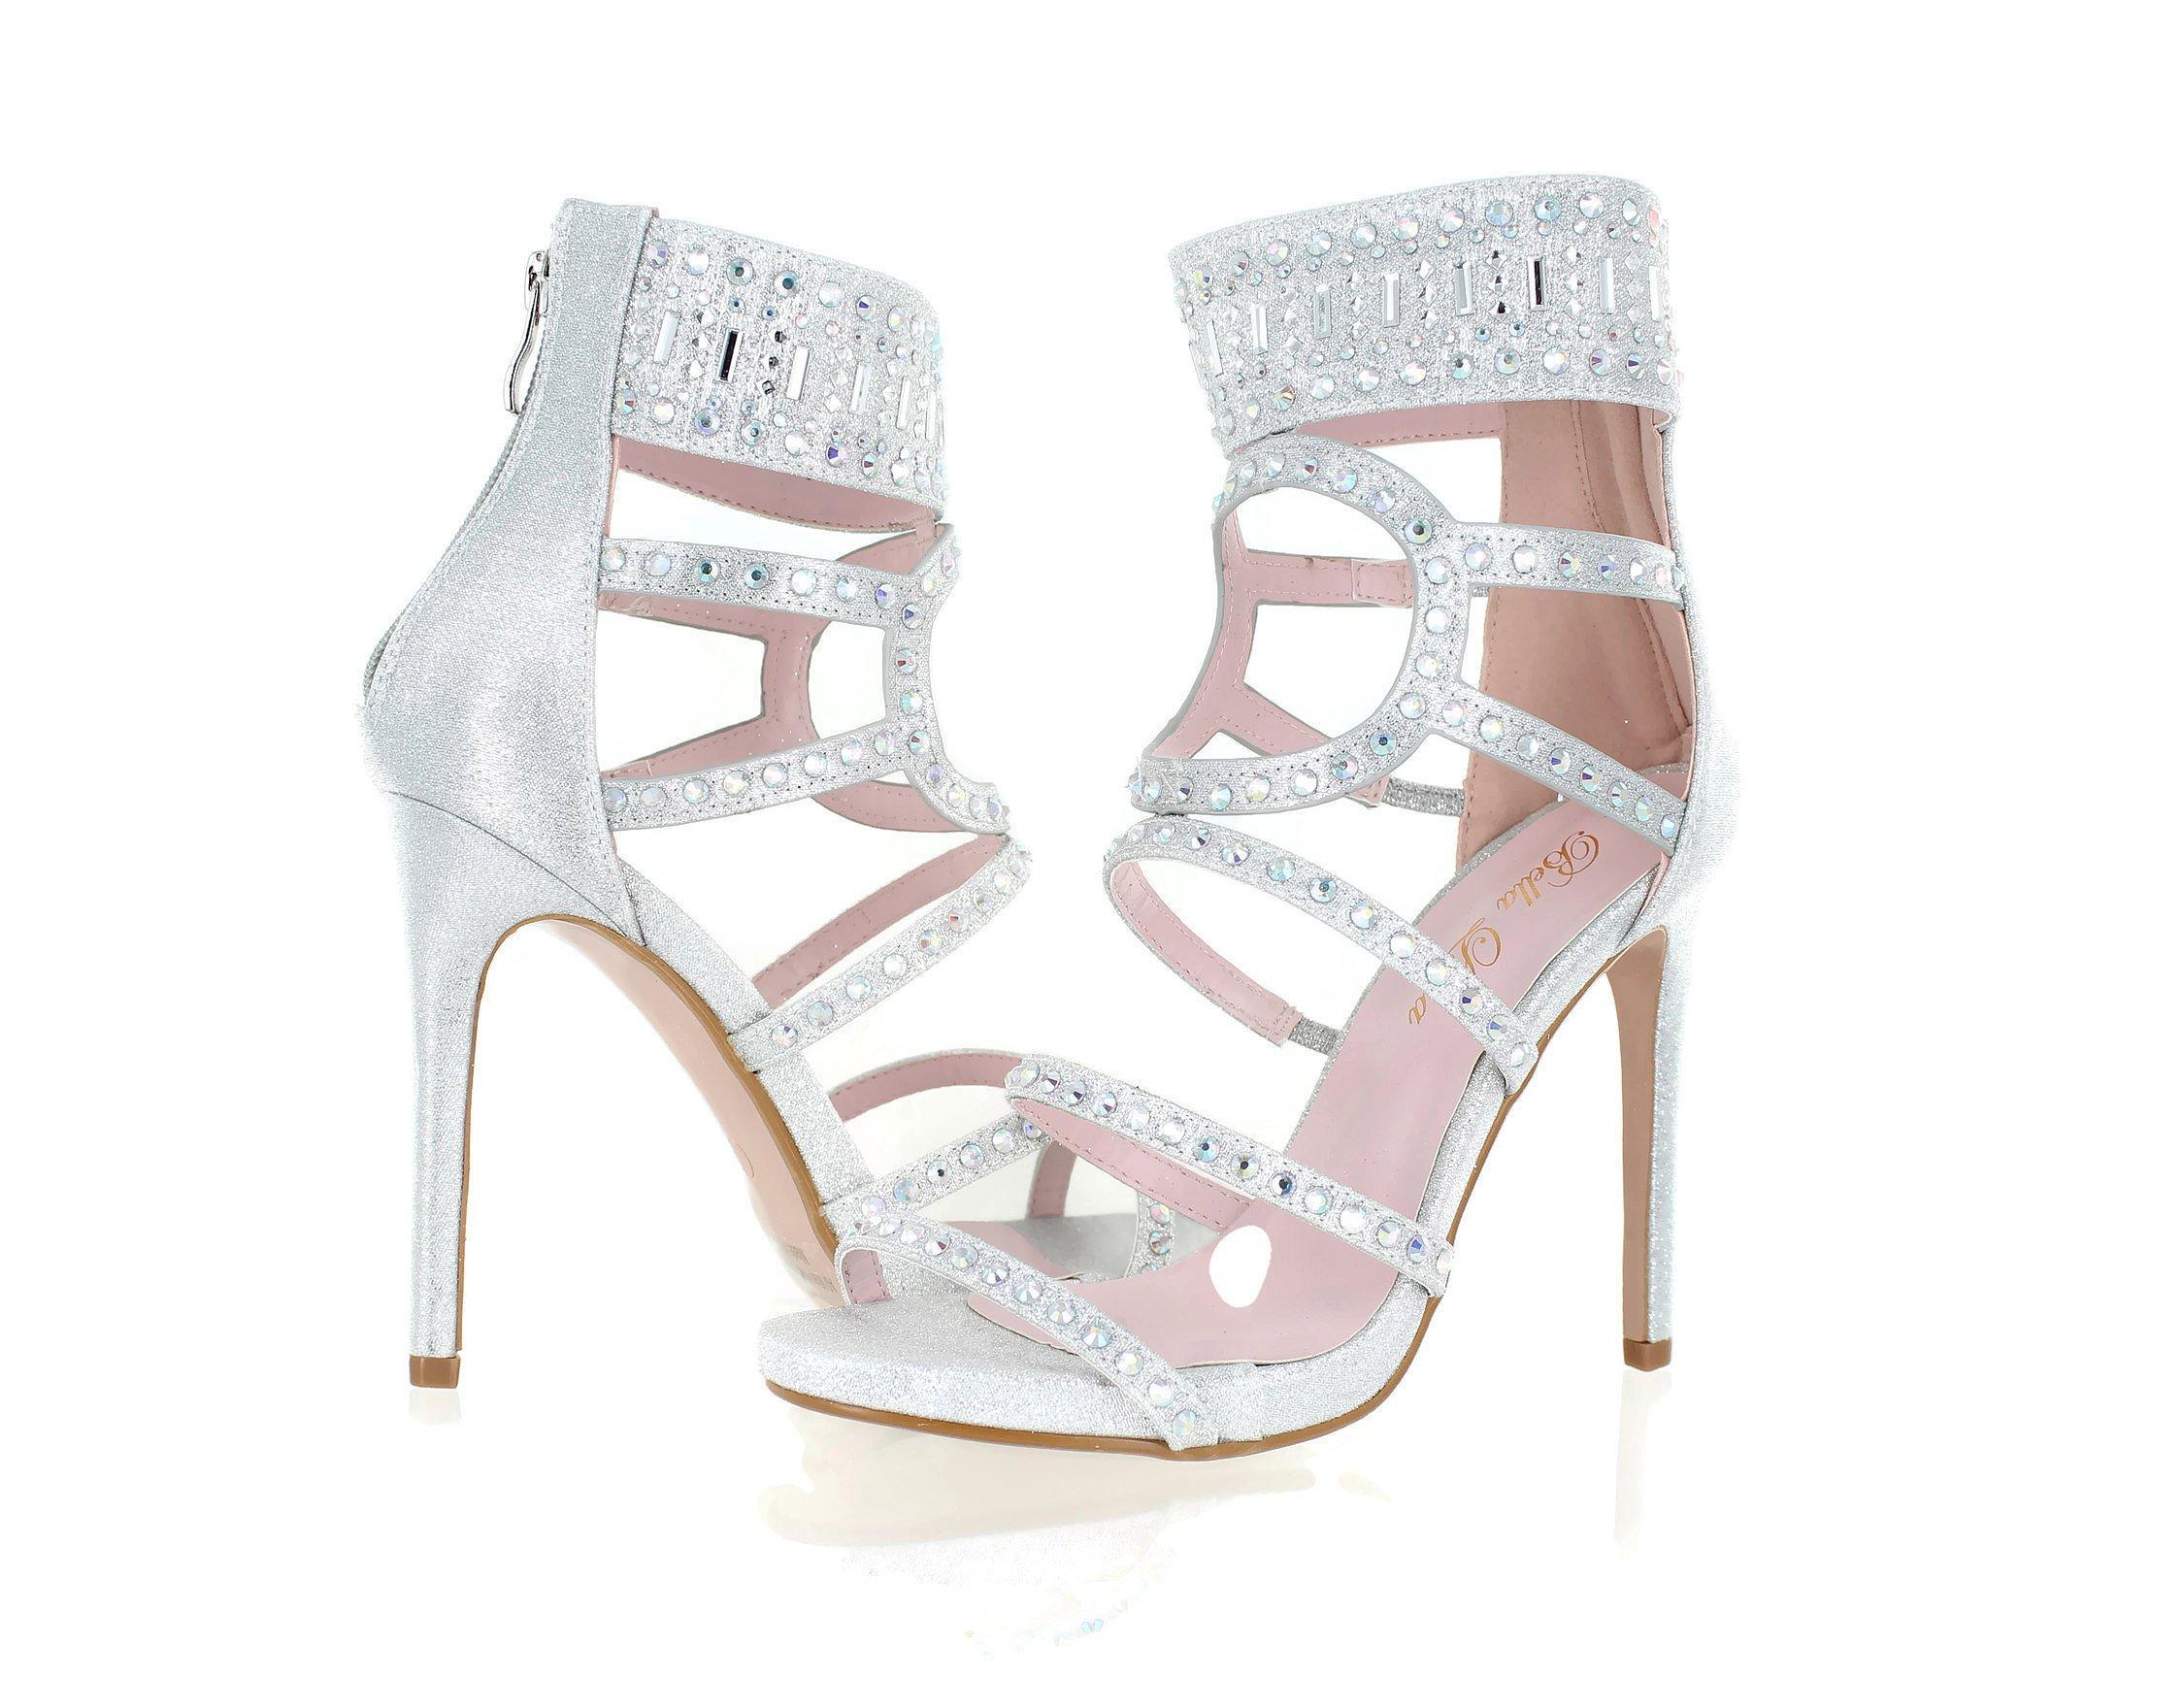 Urban Heel Women's Rhinestone Strappy Gladiator Stiletto Heels